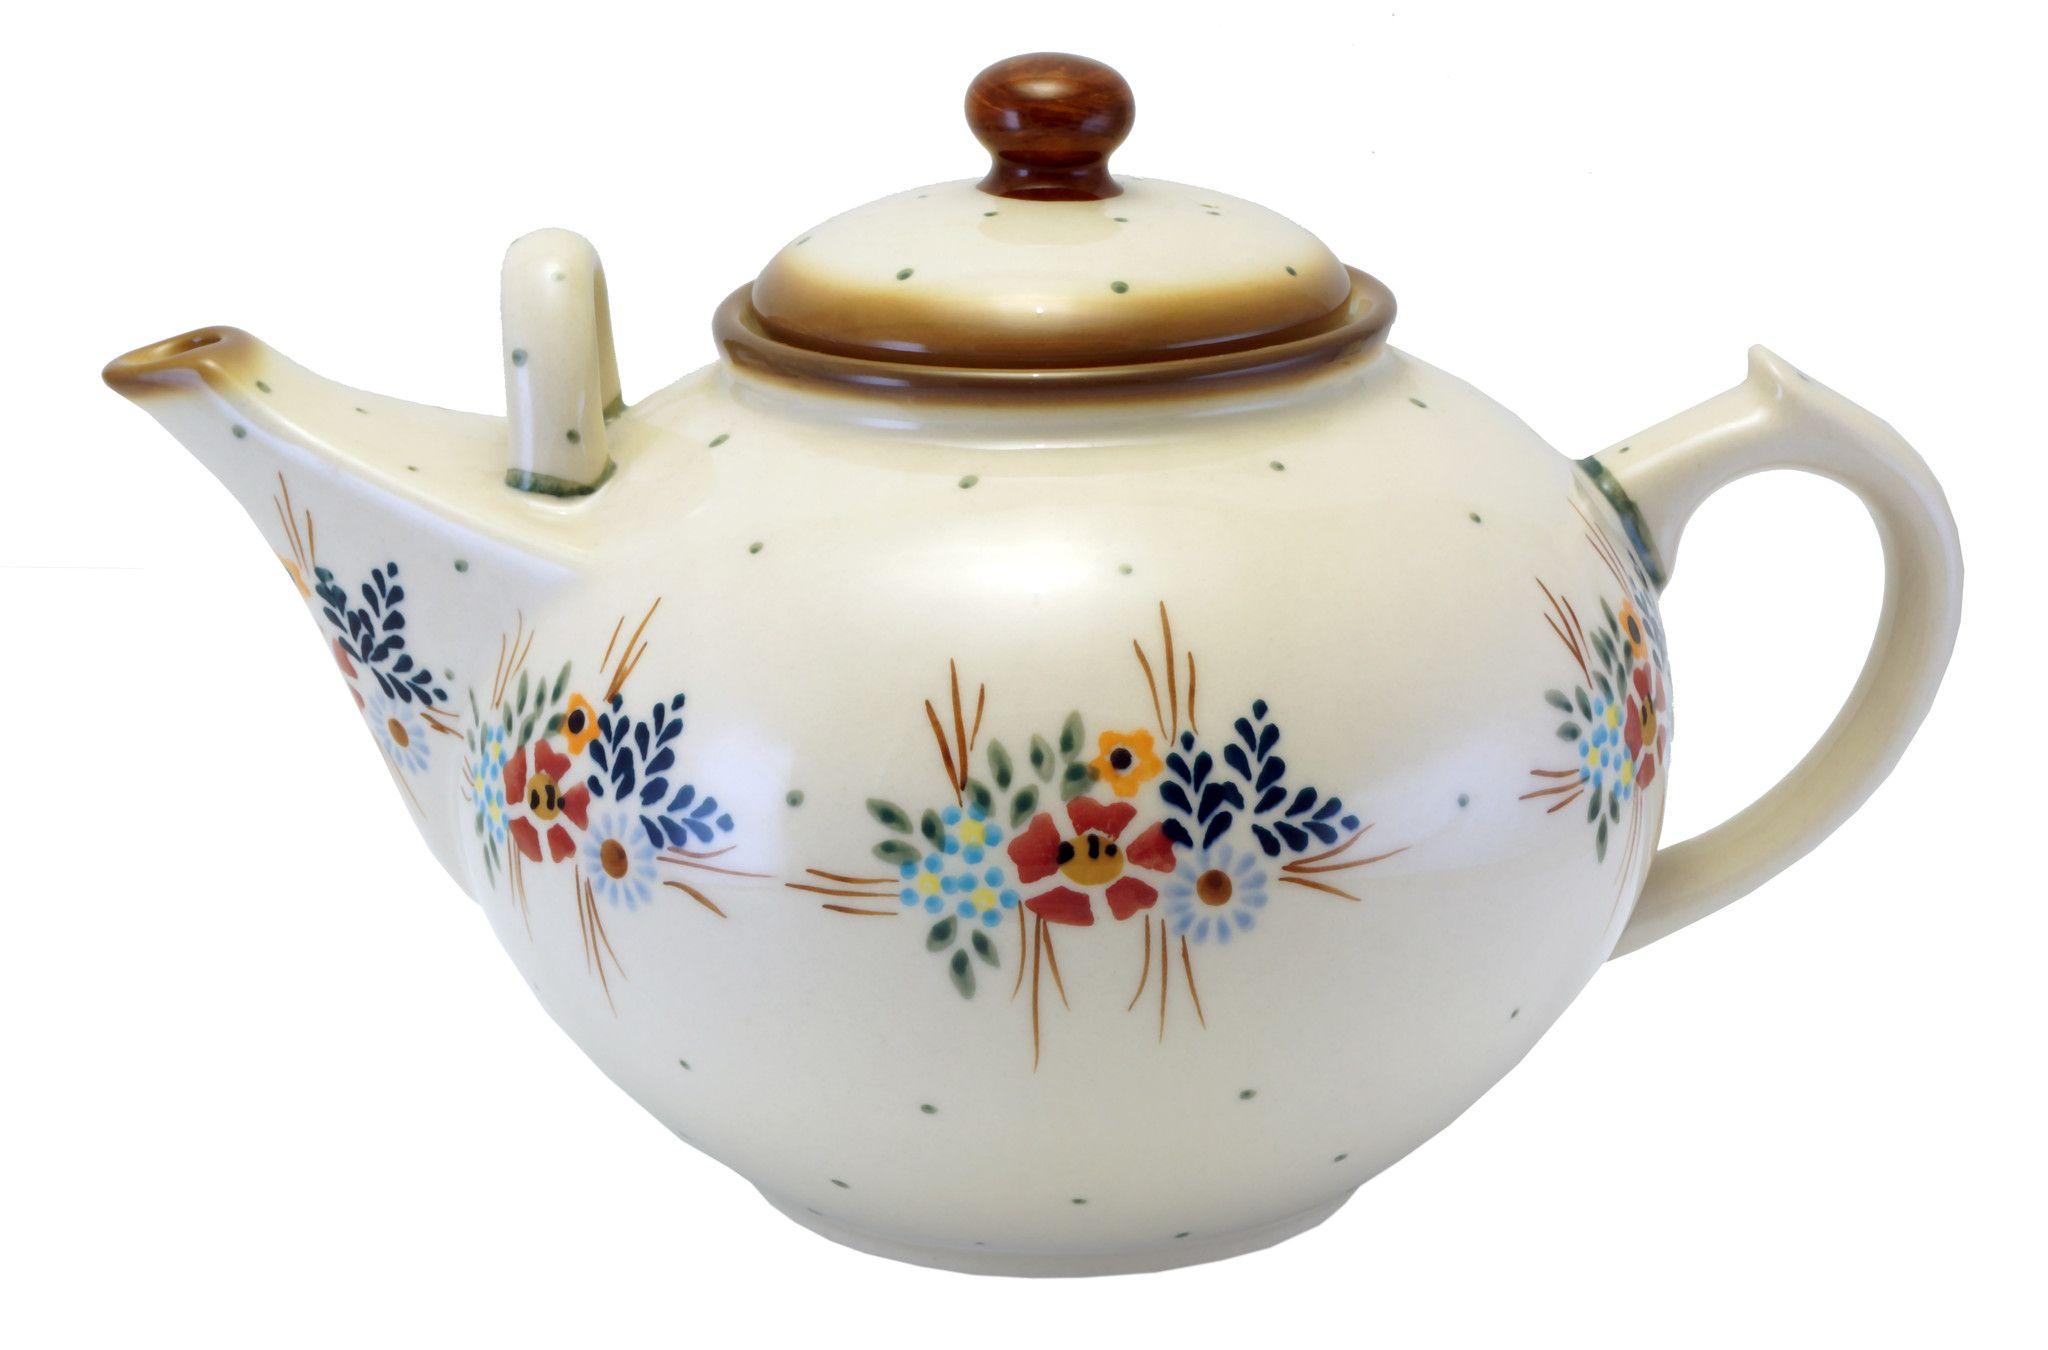 Polish Pottery - The 3 Liter Teapot - Blue on Blue | The Polish Pottery Outlet